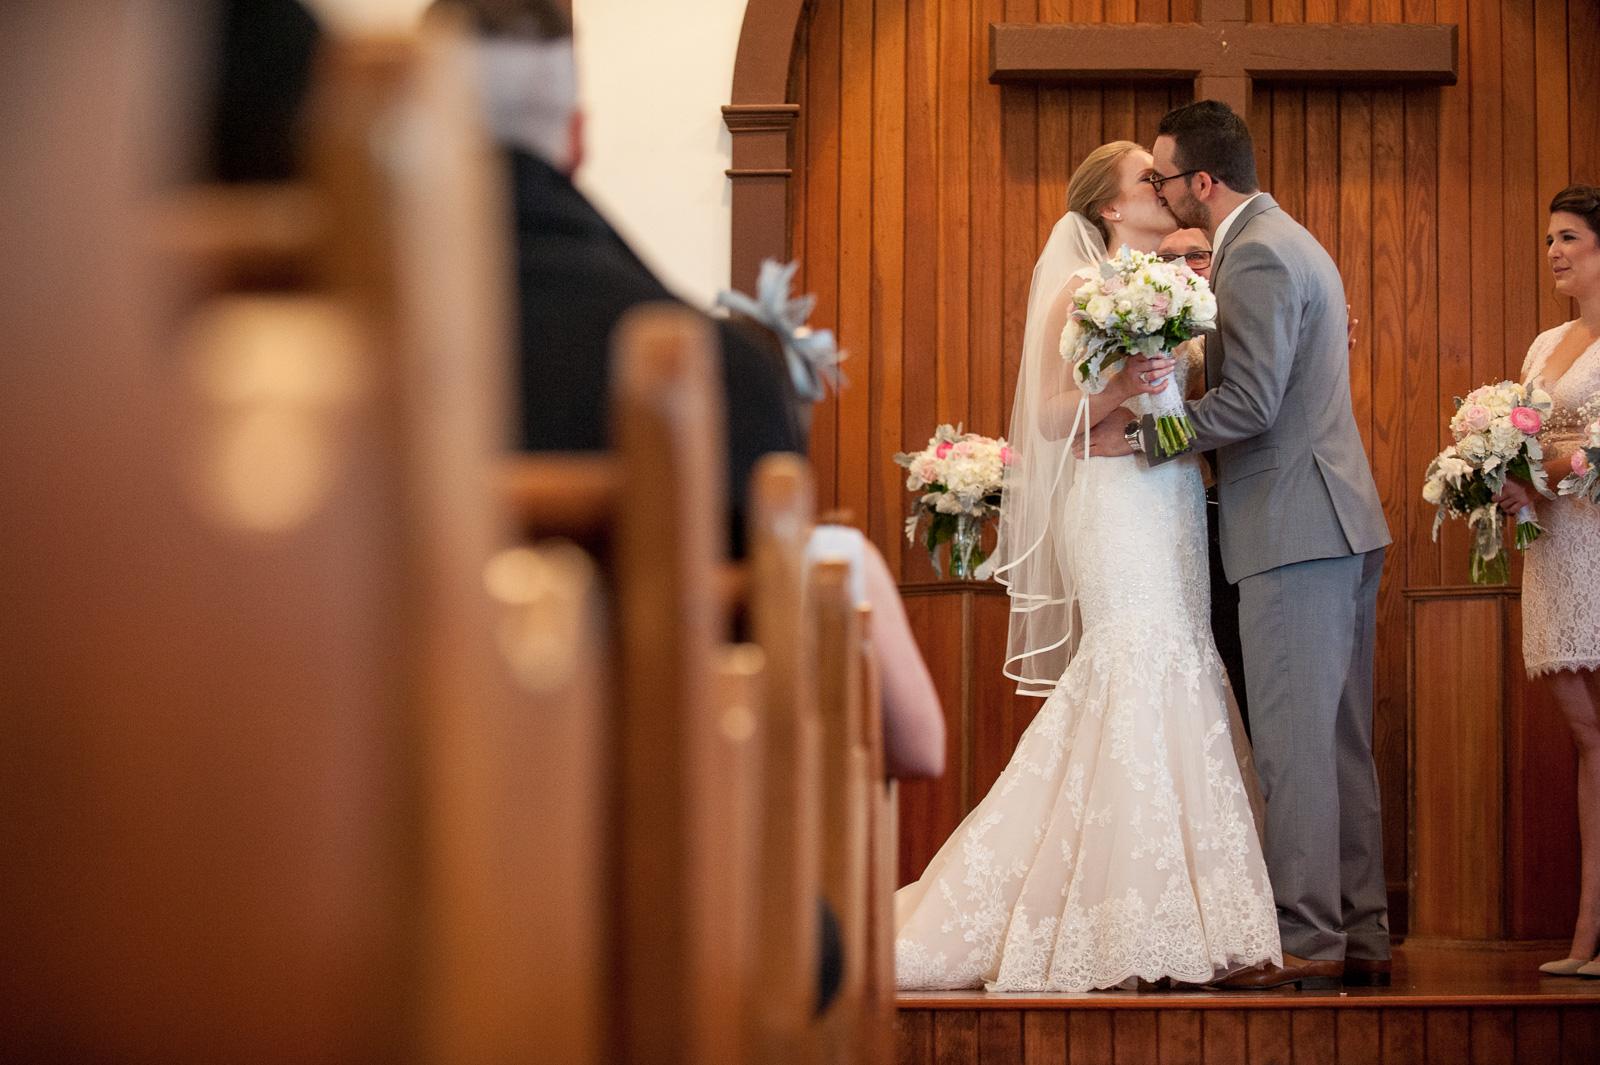 victoria-wedding-photographers-milner-chapel-wedding-centennial-lodge-wedding-16.jpg